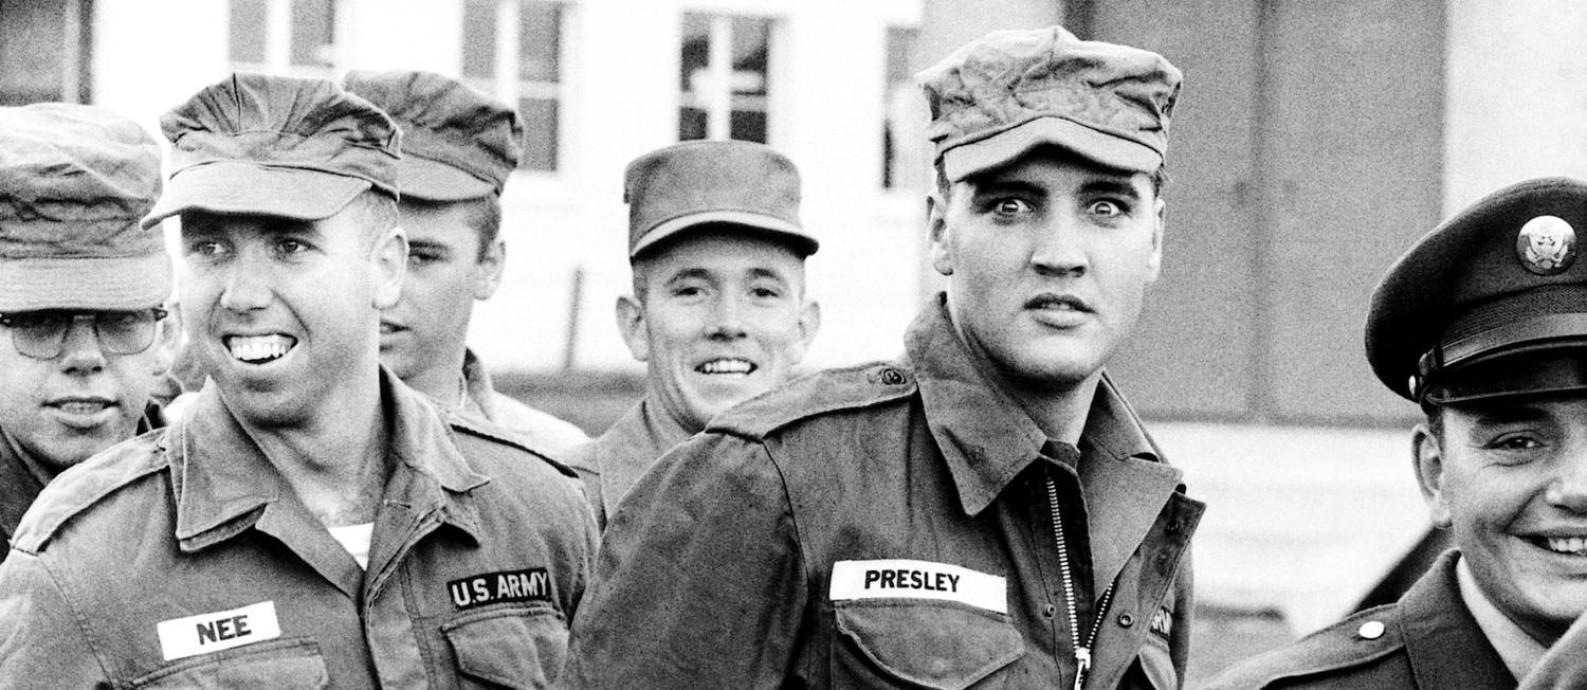 Elvis Presley no serviço militar, em 1958 Foto: Robert Lebeck / Arquivo